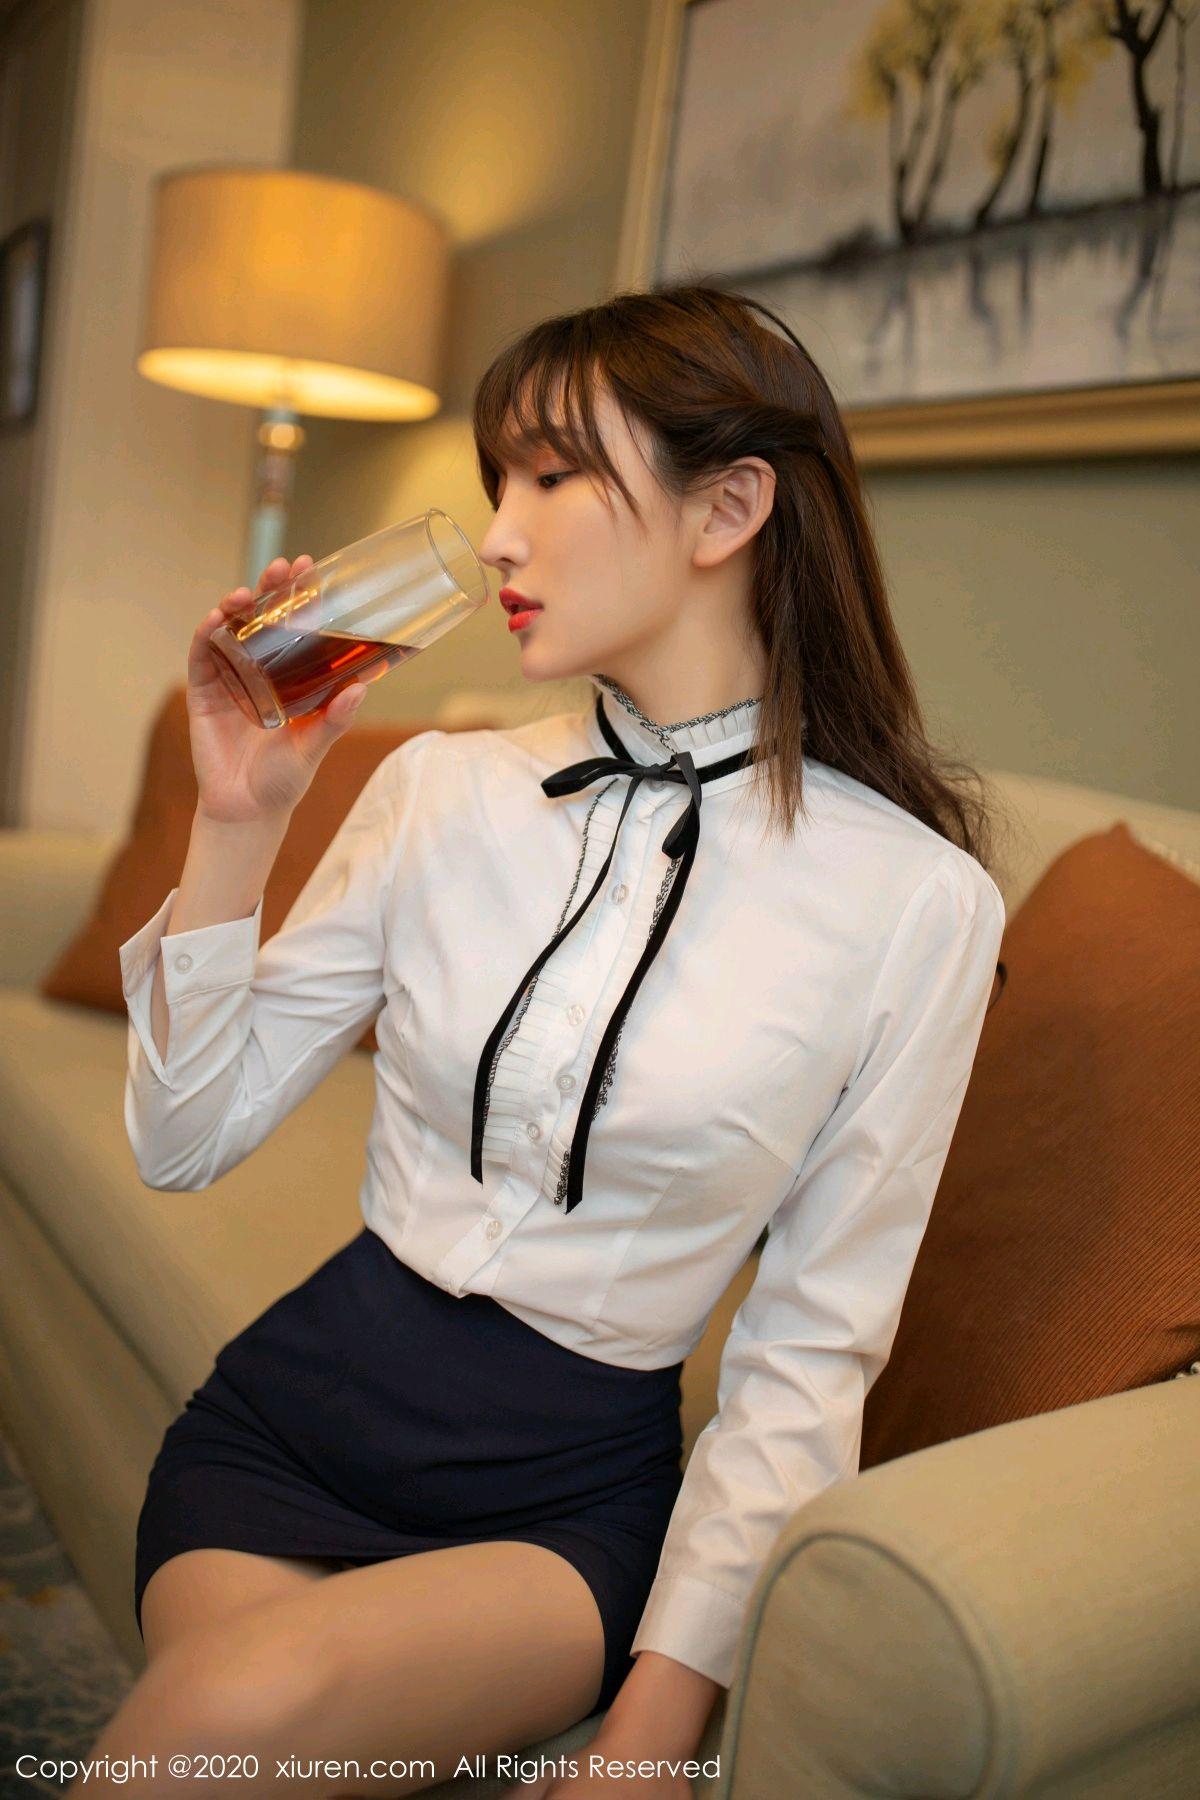 [XiuRen] Vol.2626 Secrets in mobile phones 9P, Chen Xiao Miao, Lu Xuan Xuan, School Uniform, Sisters, Xiuren